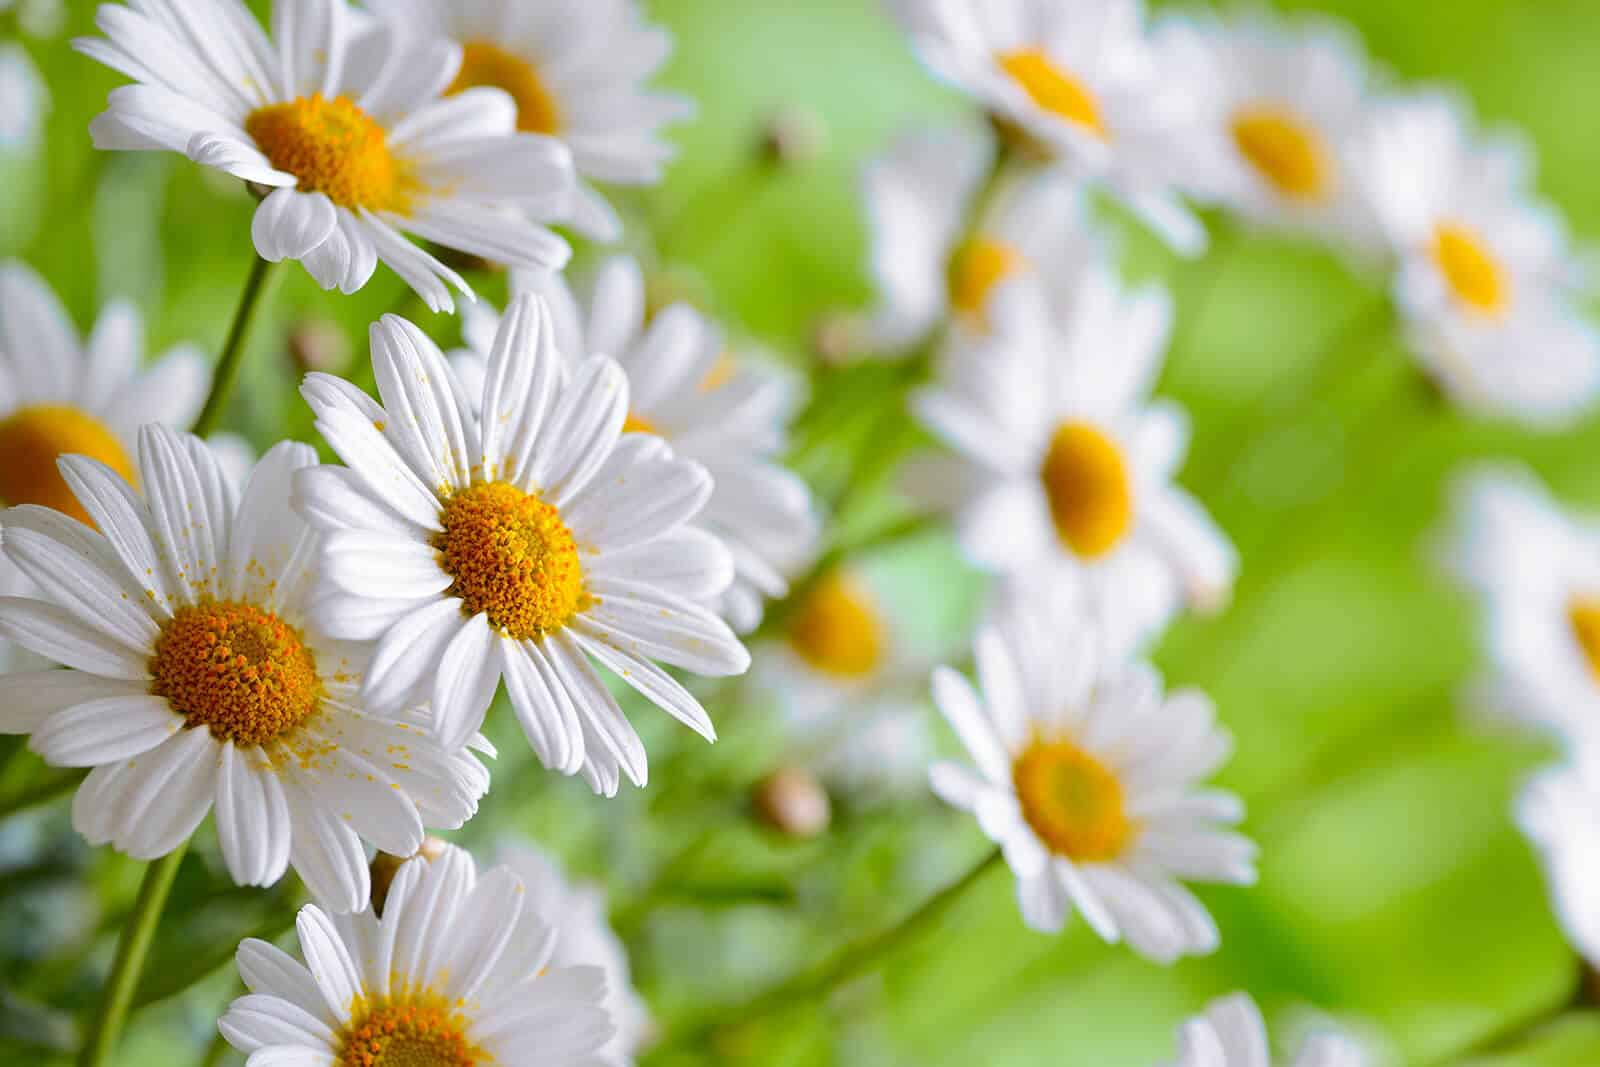 wellnessaromas-aromatherapy-essential-oil_chamomile-benefits-uses